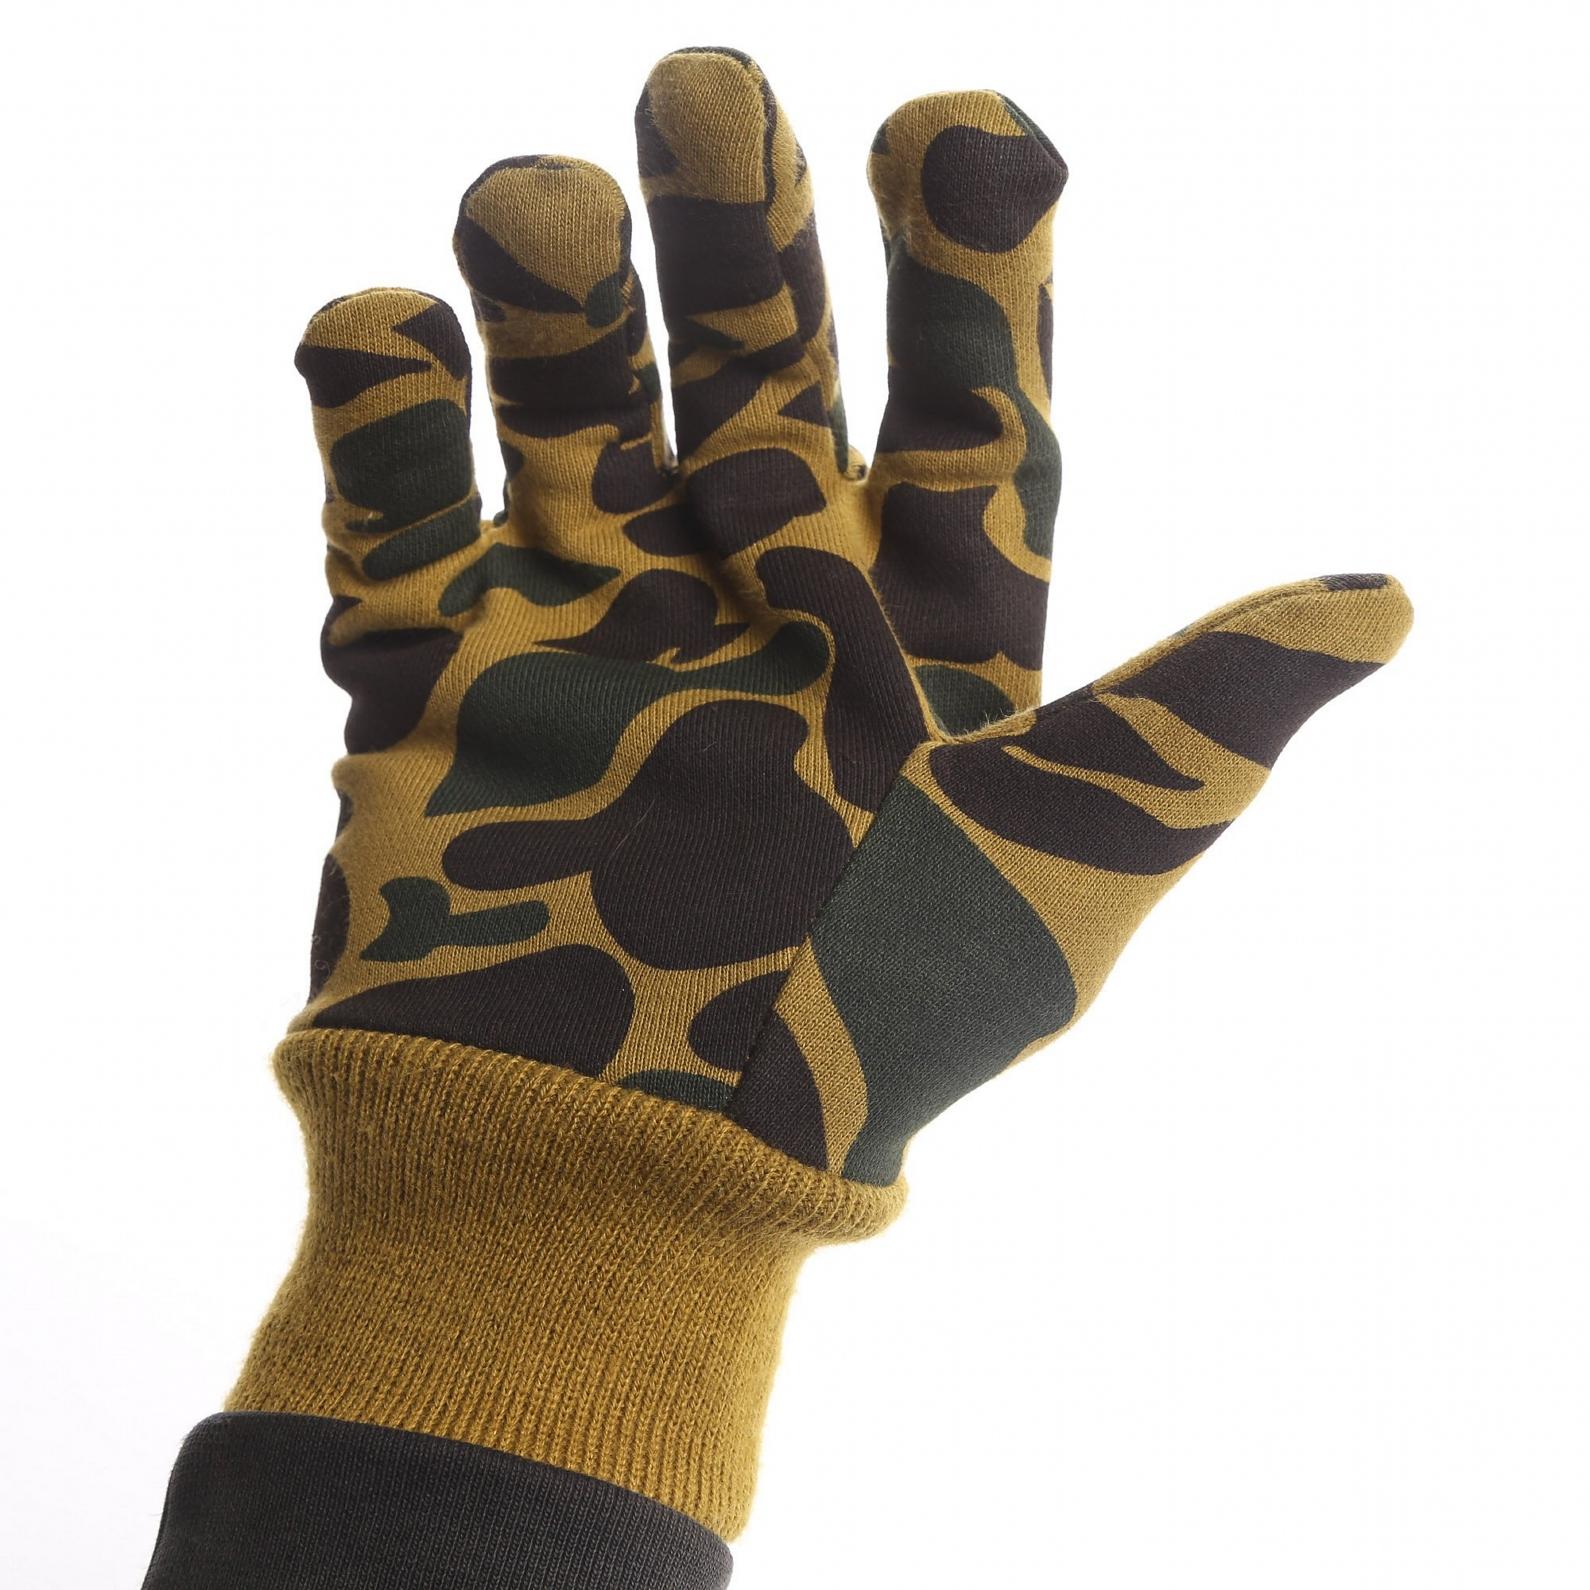 【OFF SAFETY/オフセーフティー】OFFSAFETY GLOVES 手袋 / CAMO